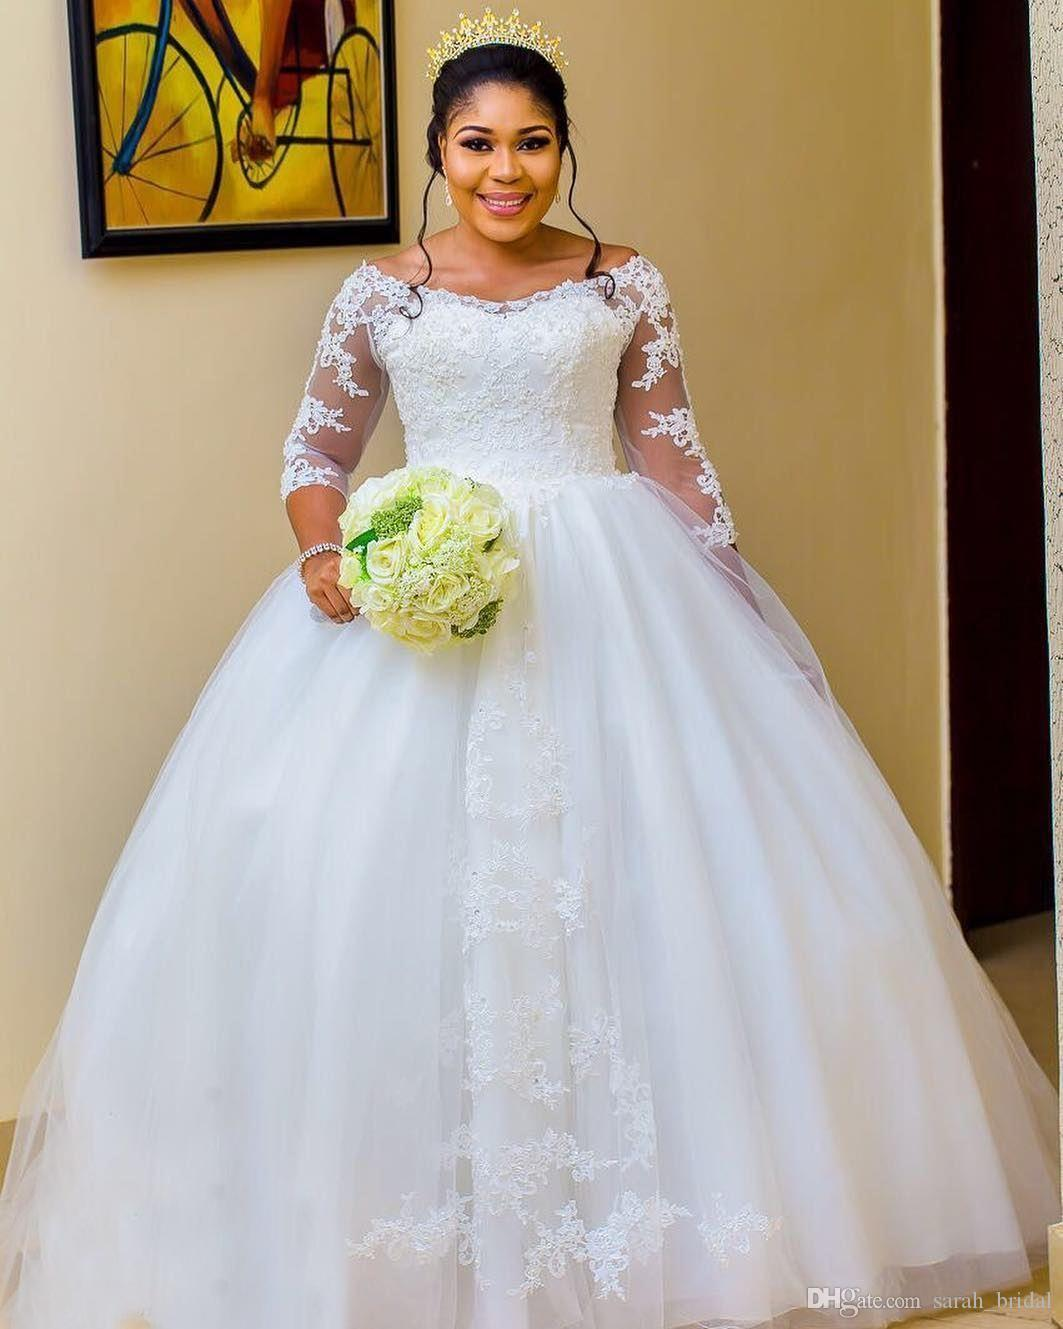 192b27fdc Vestidos De Festas Curtos Bellanaija Nigeria Mangas Compridas Vestidos De  Noiva 2018 Vestido De Baile Plus Size Fora Do Ombro Do Laço Do Vintage  Meninas ...